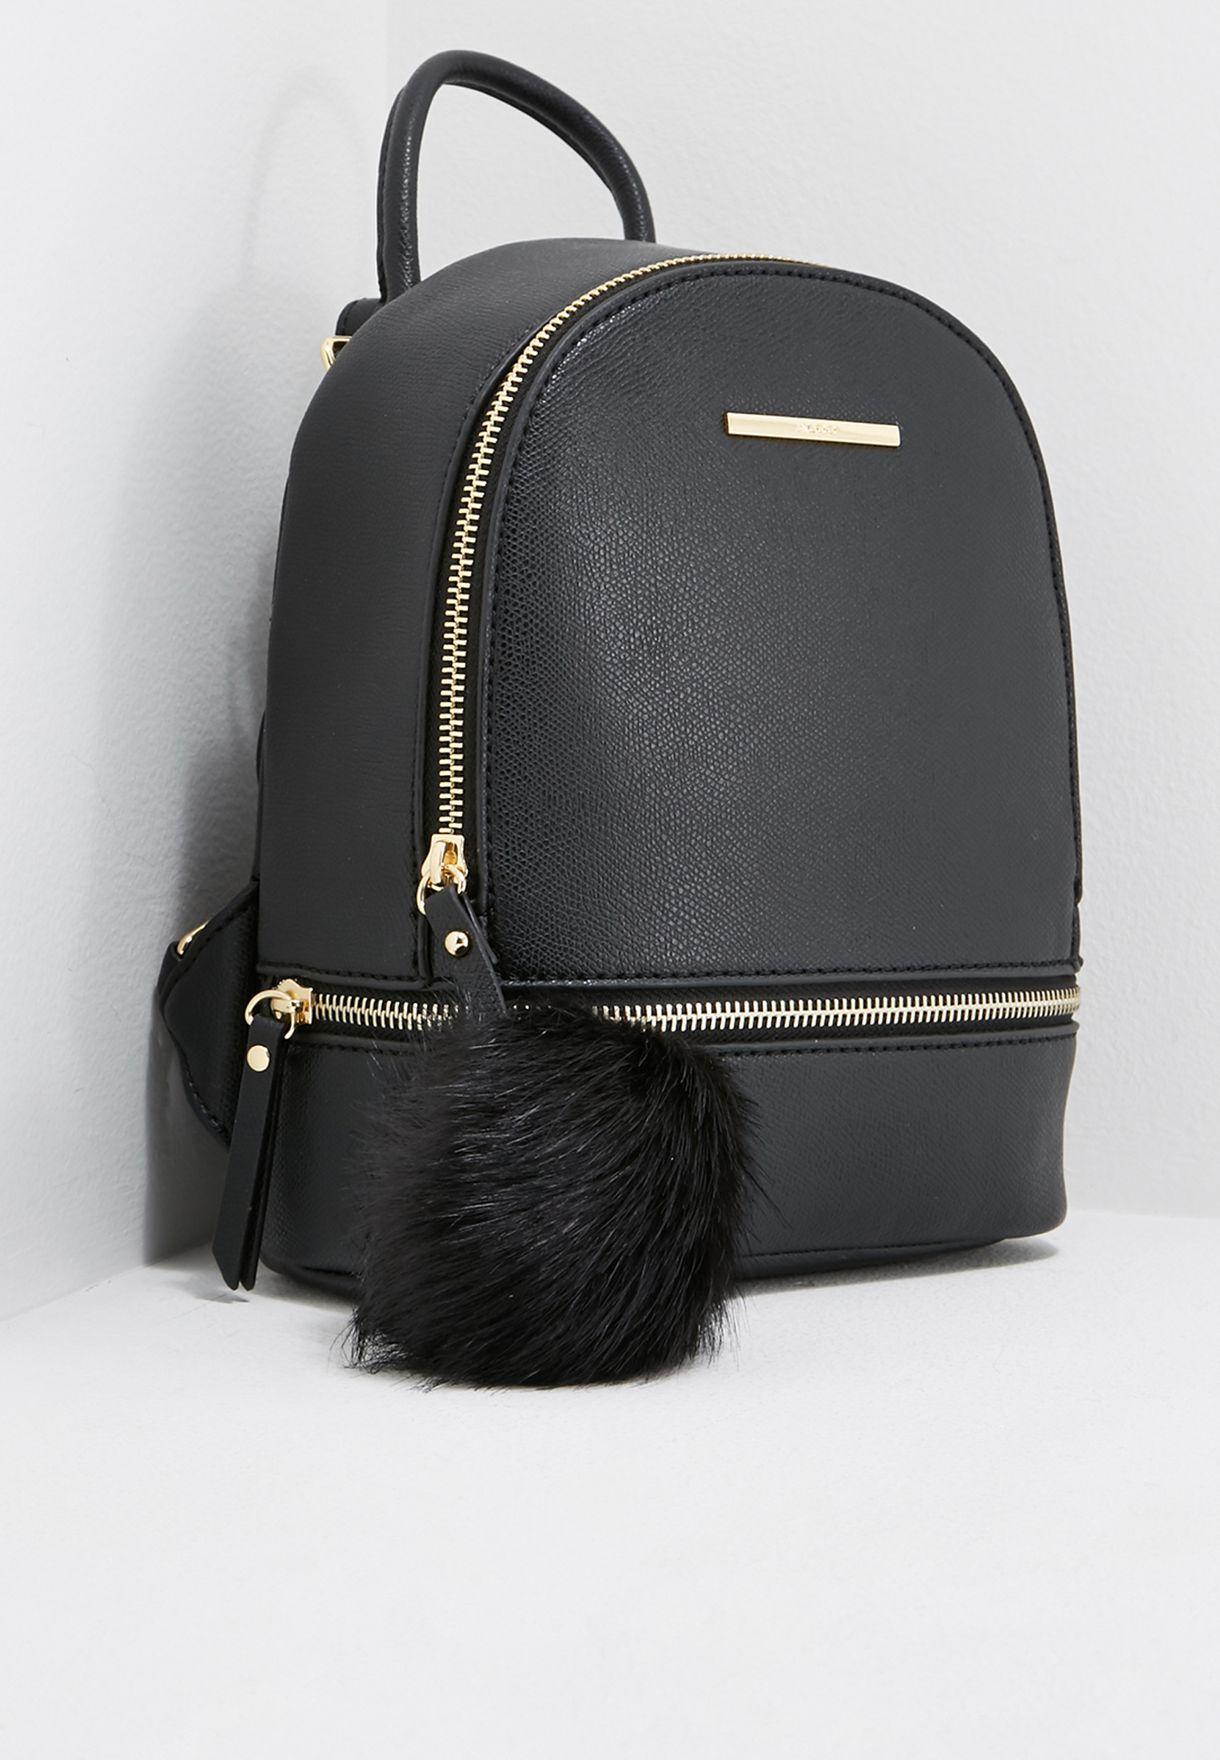 7c0817e40477 Shop Aldo black Mini Parma Backpack PARMA98 for Women in UAE ...